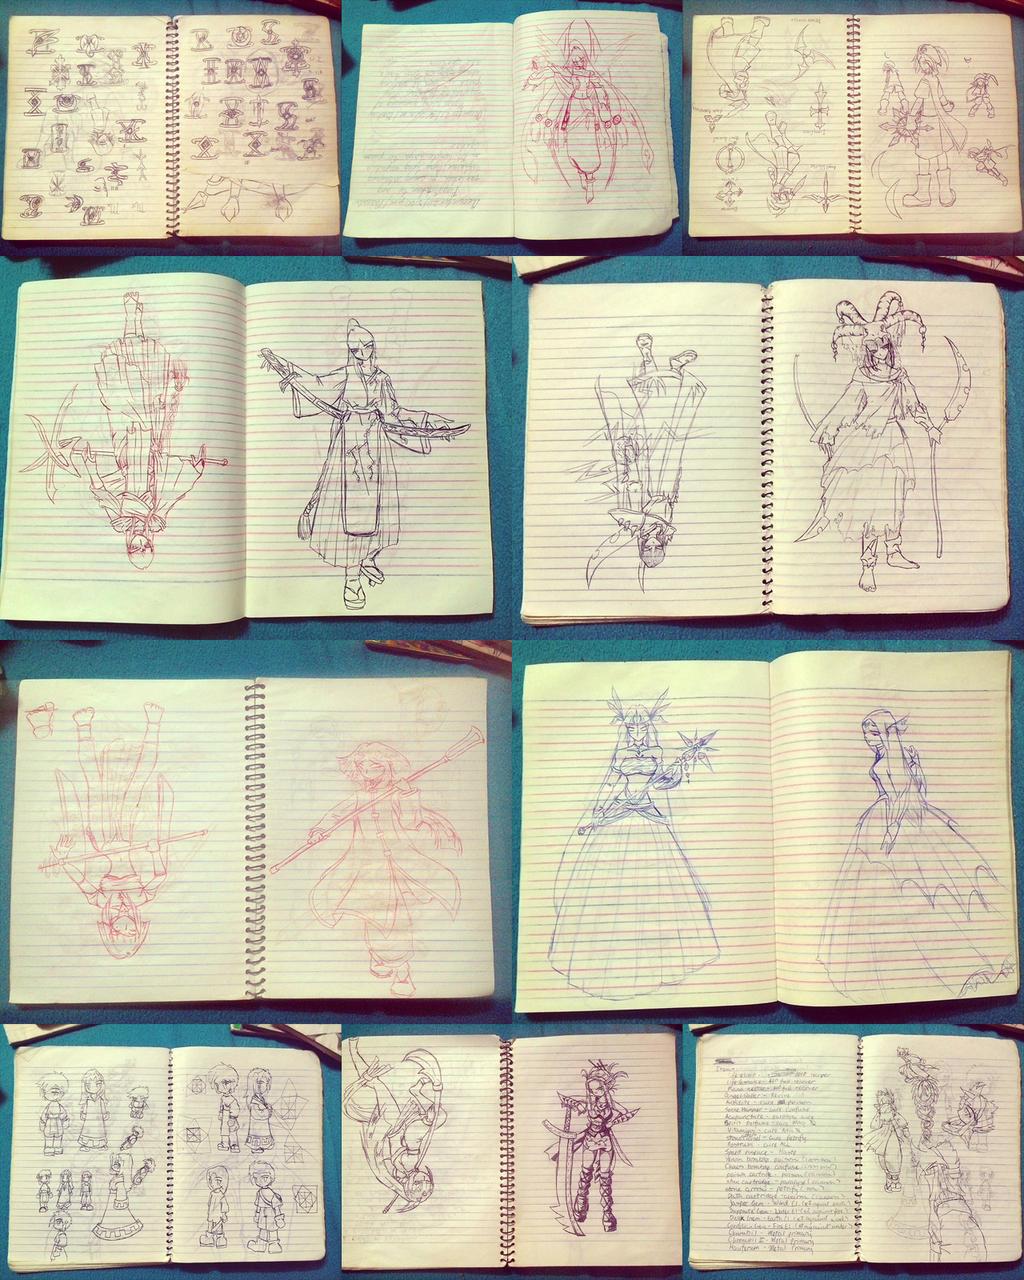 Highschool Notebook Doodles 1 by Ylden on DeviantArt